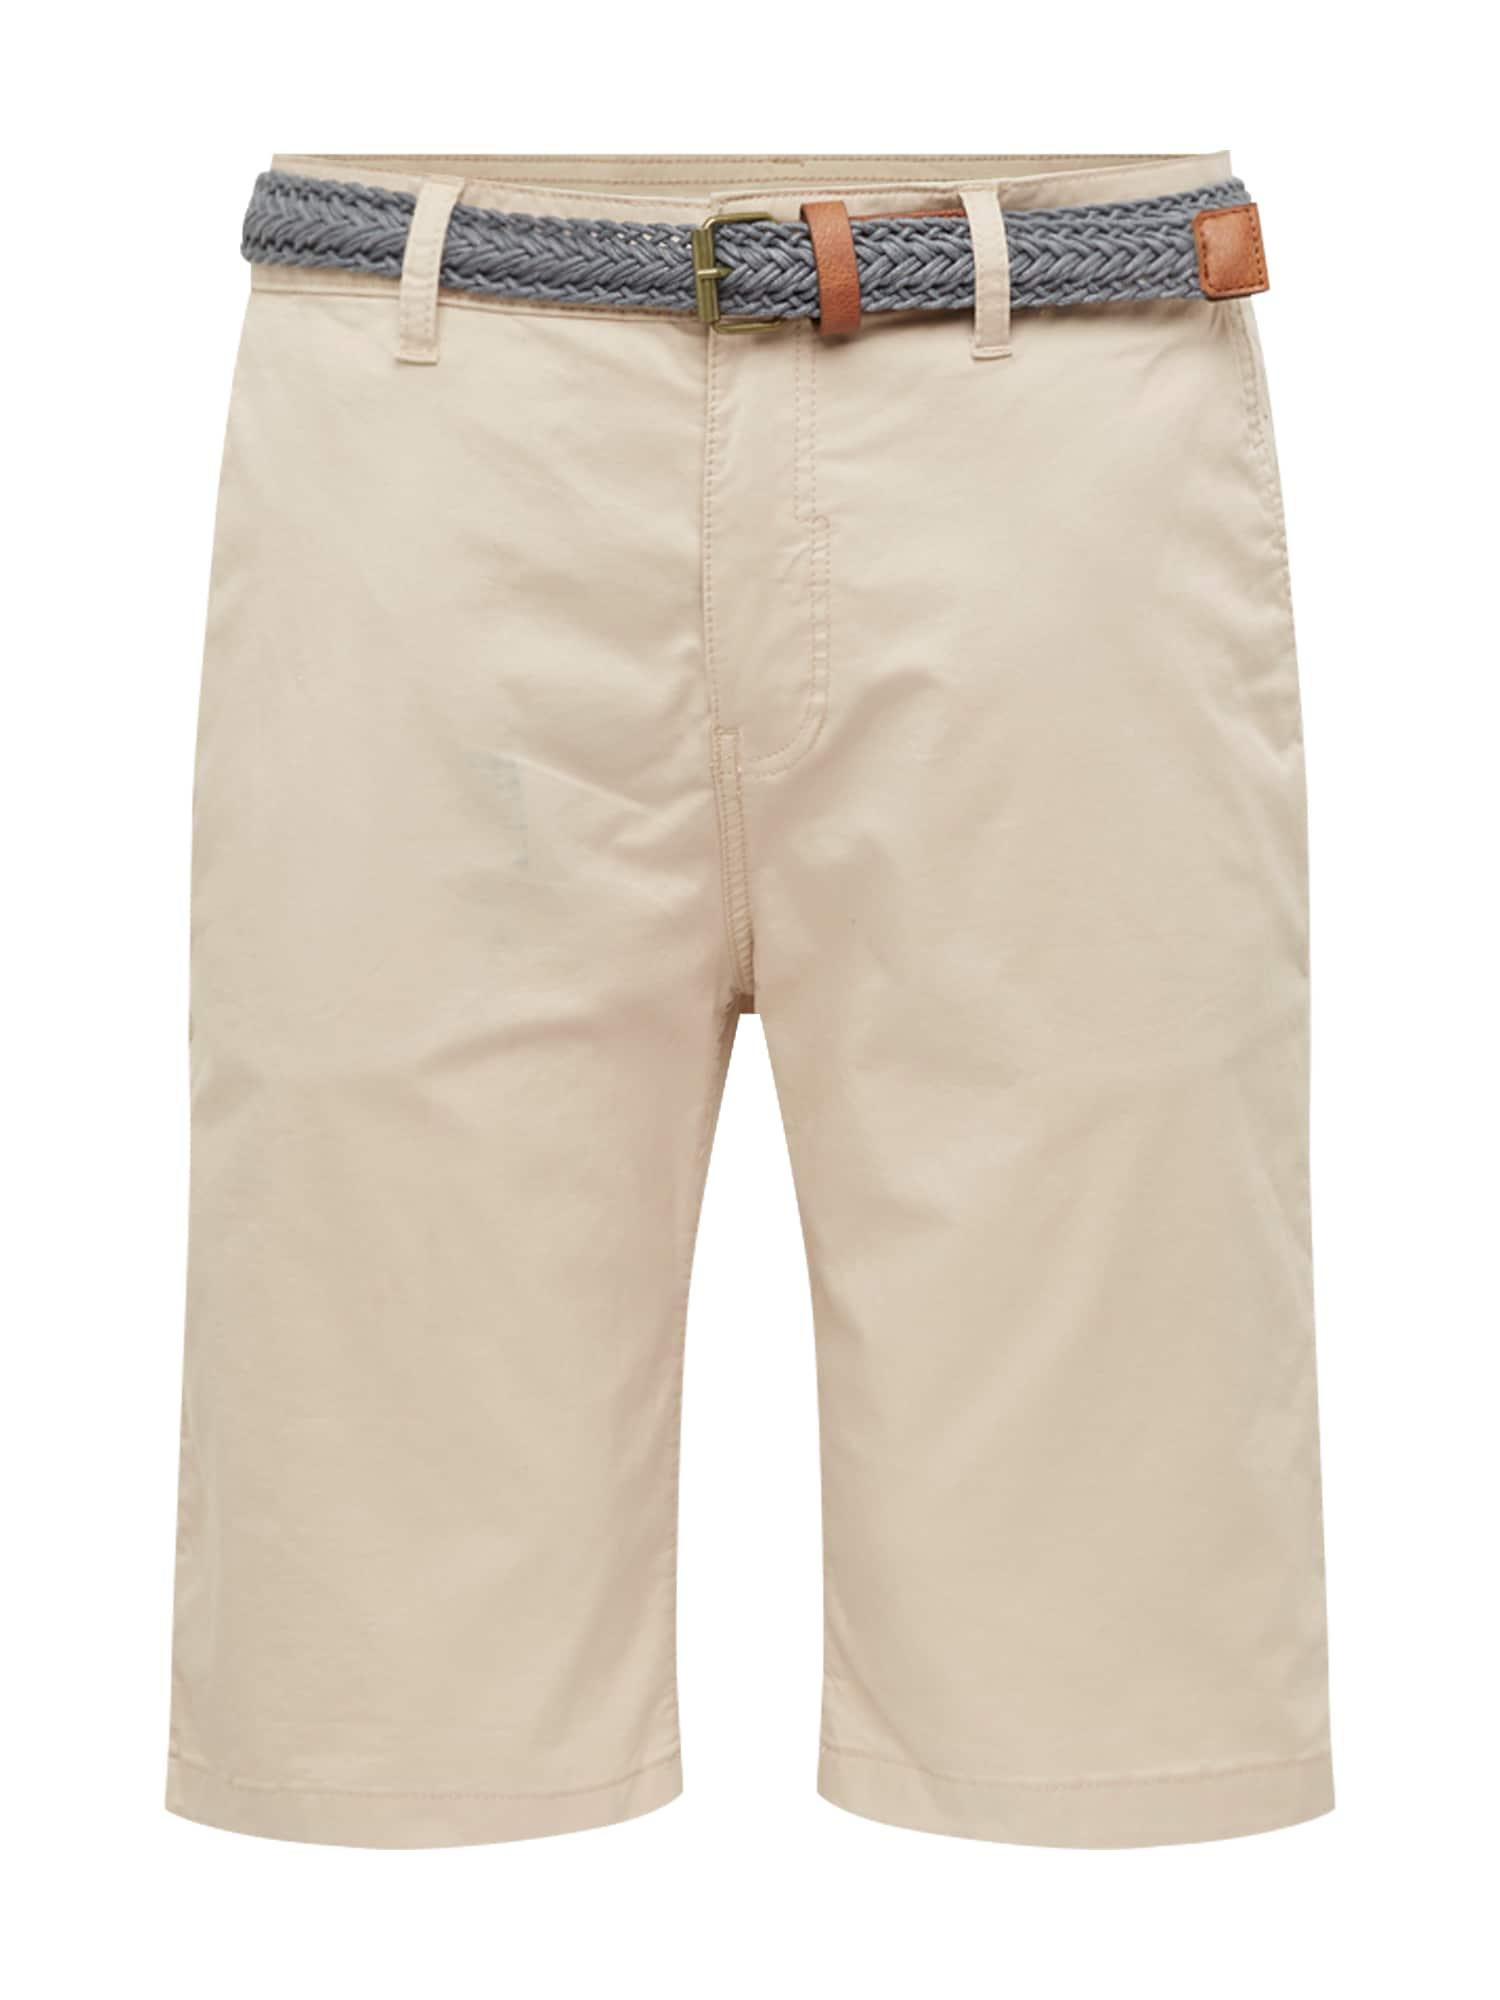 Chino kalhoty NOOS OCS béžová ESPRIT